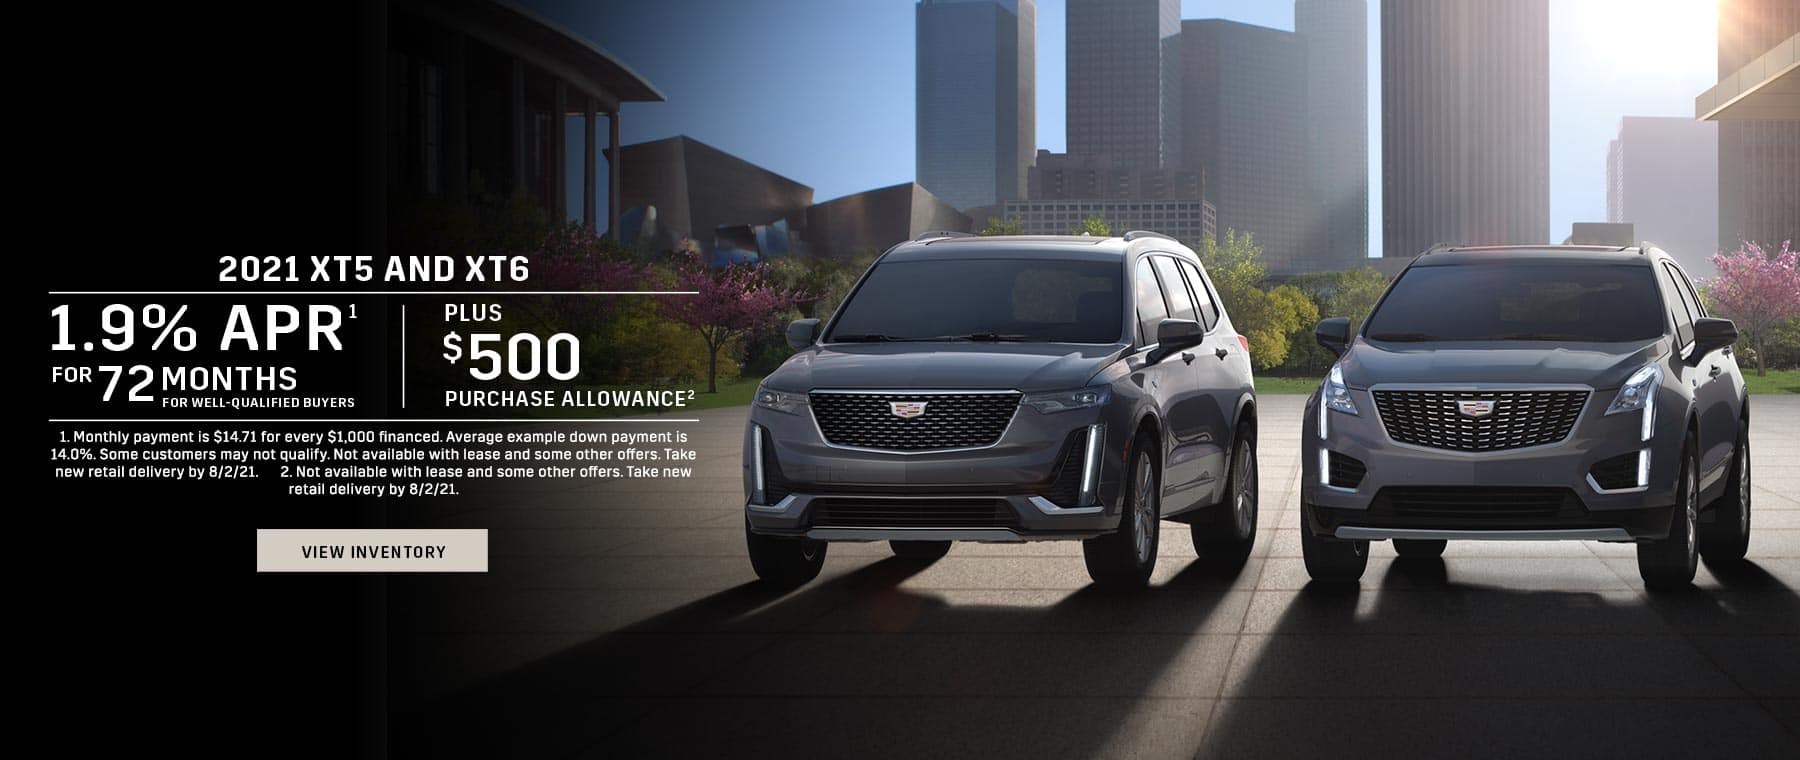 2021 Cadillac XT5 & XT6 offer